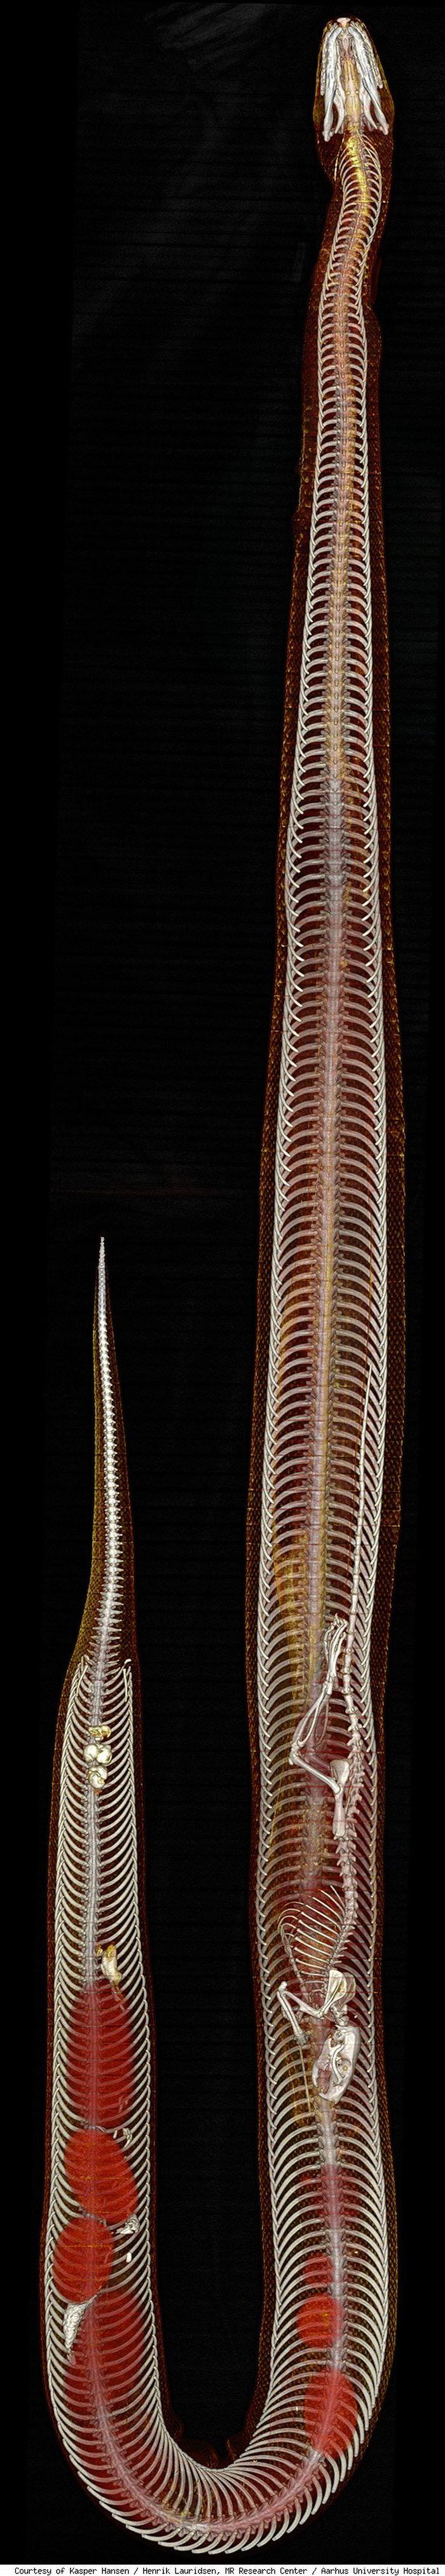 Rat Inside a Python (4 pics)